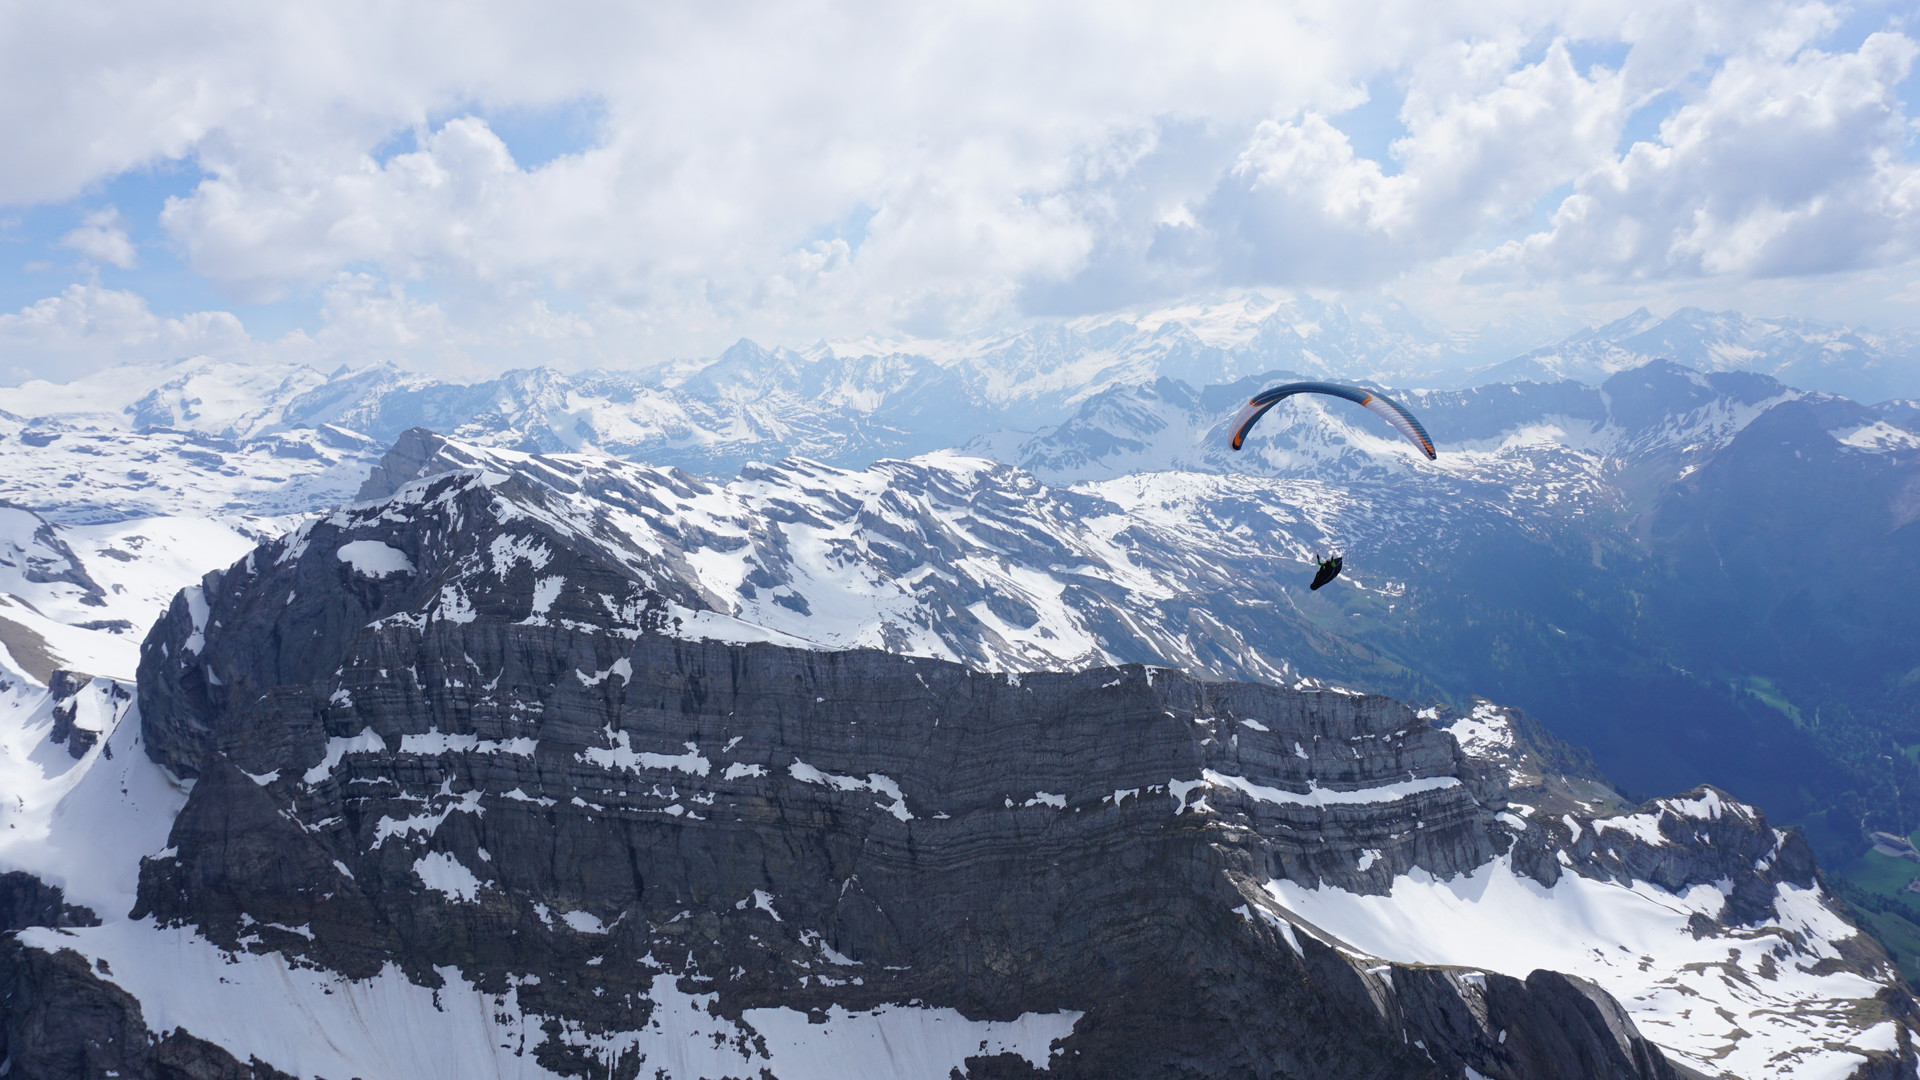 The magic Alps